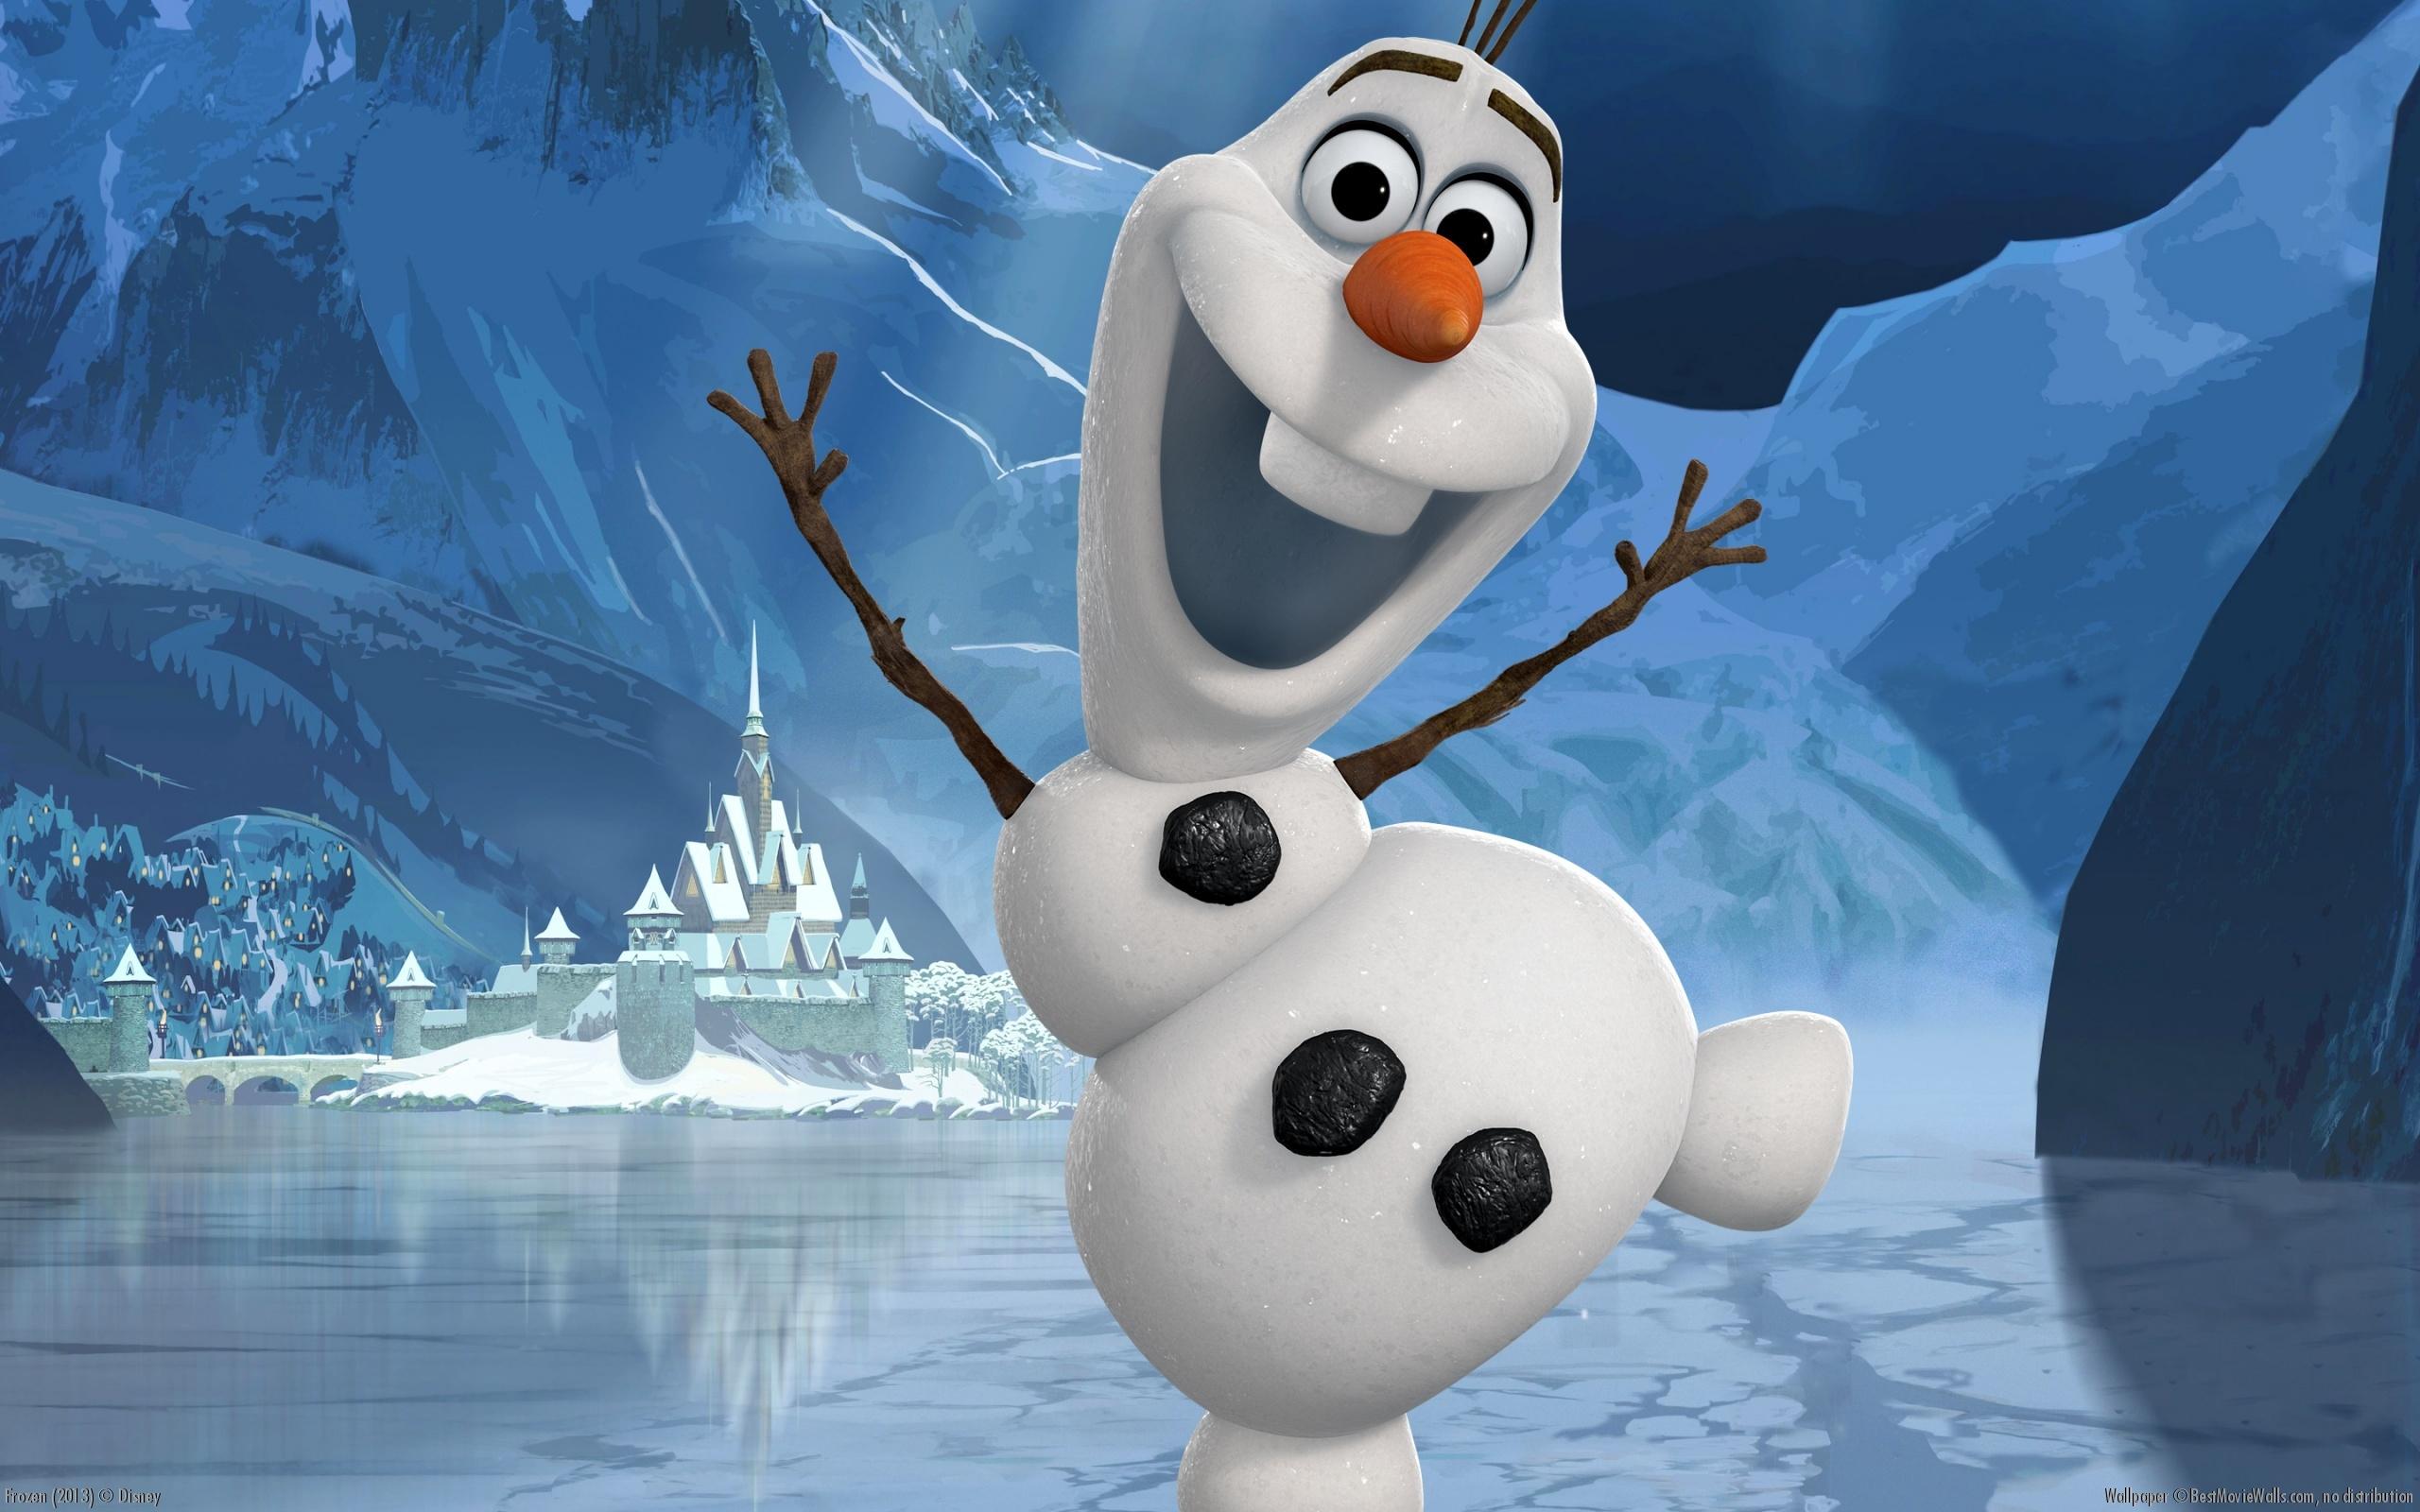 Frozen images Olaf Wallpaper wallpaper photos 36065985 2560x1600